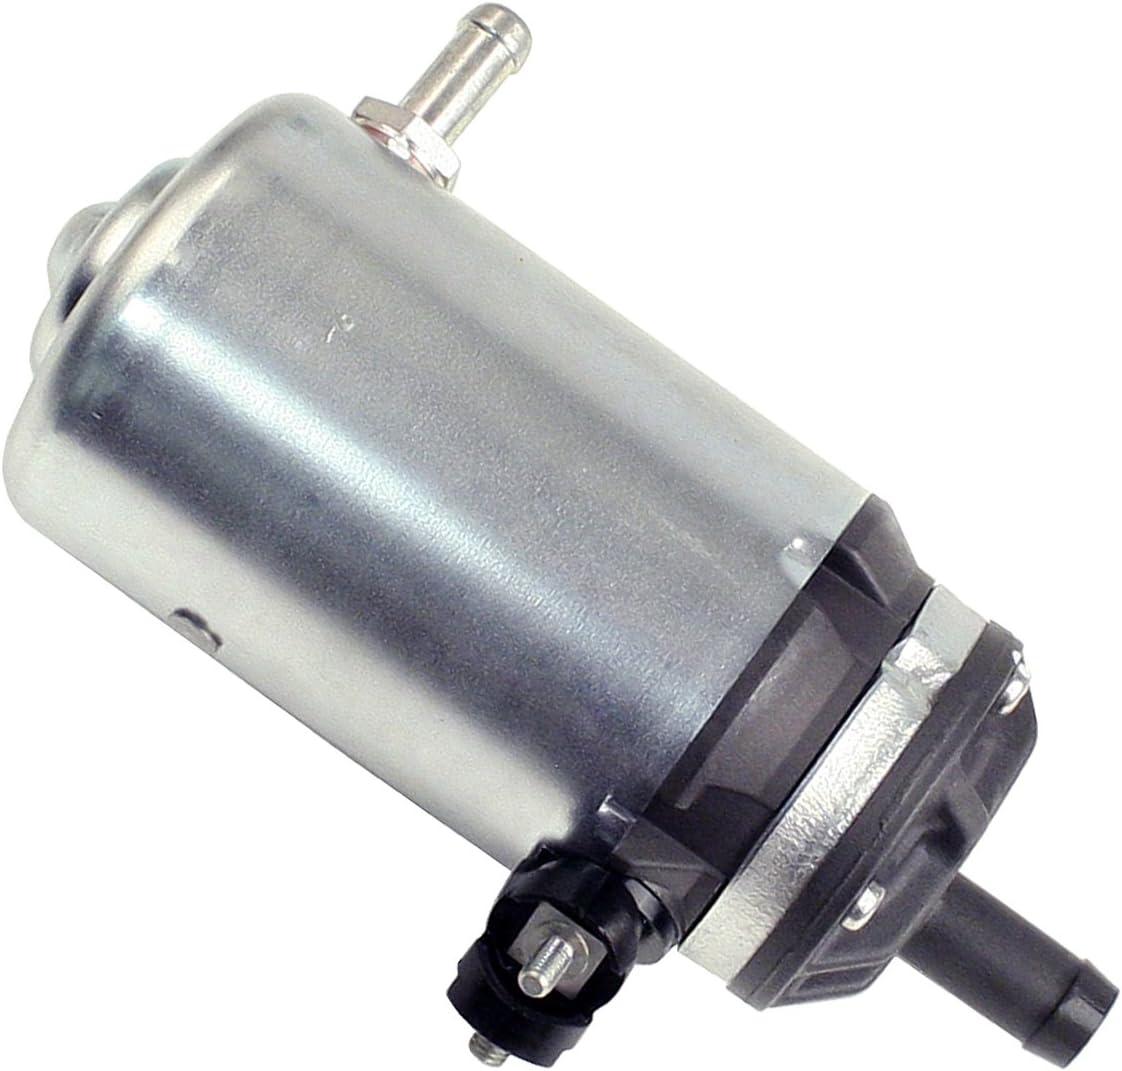 Beck Arnley 152-0941 Electric Fuel Pump